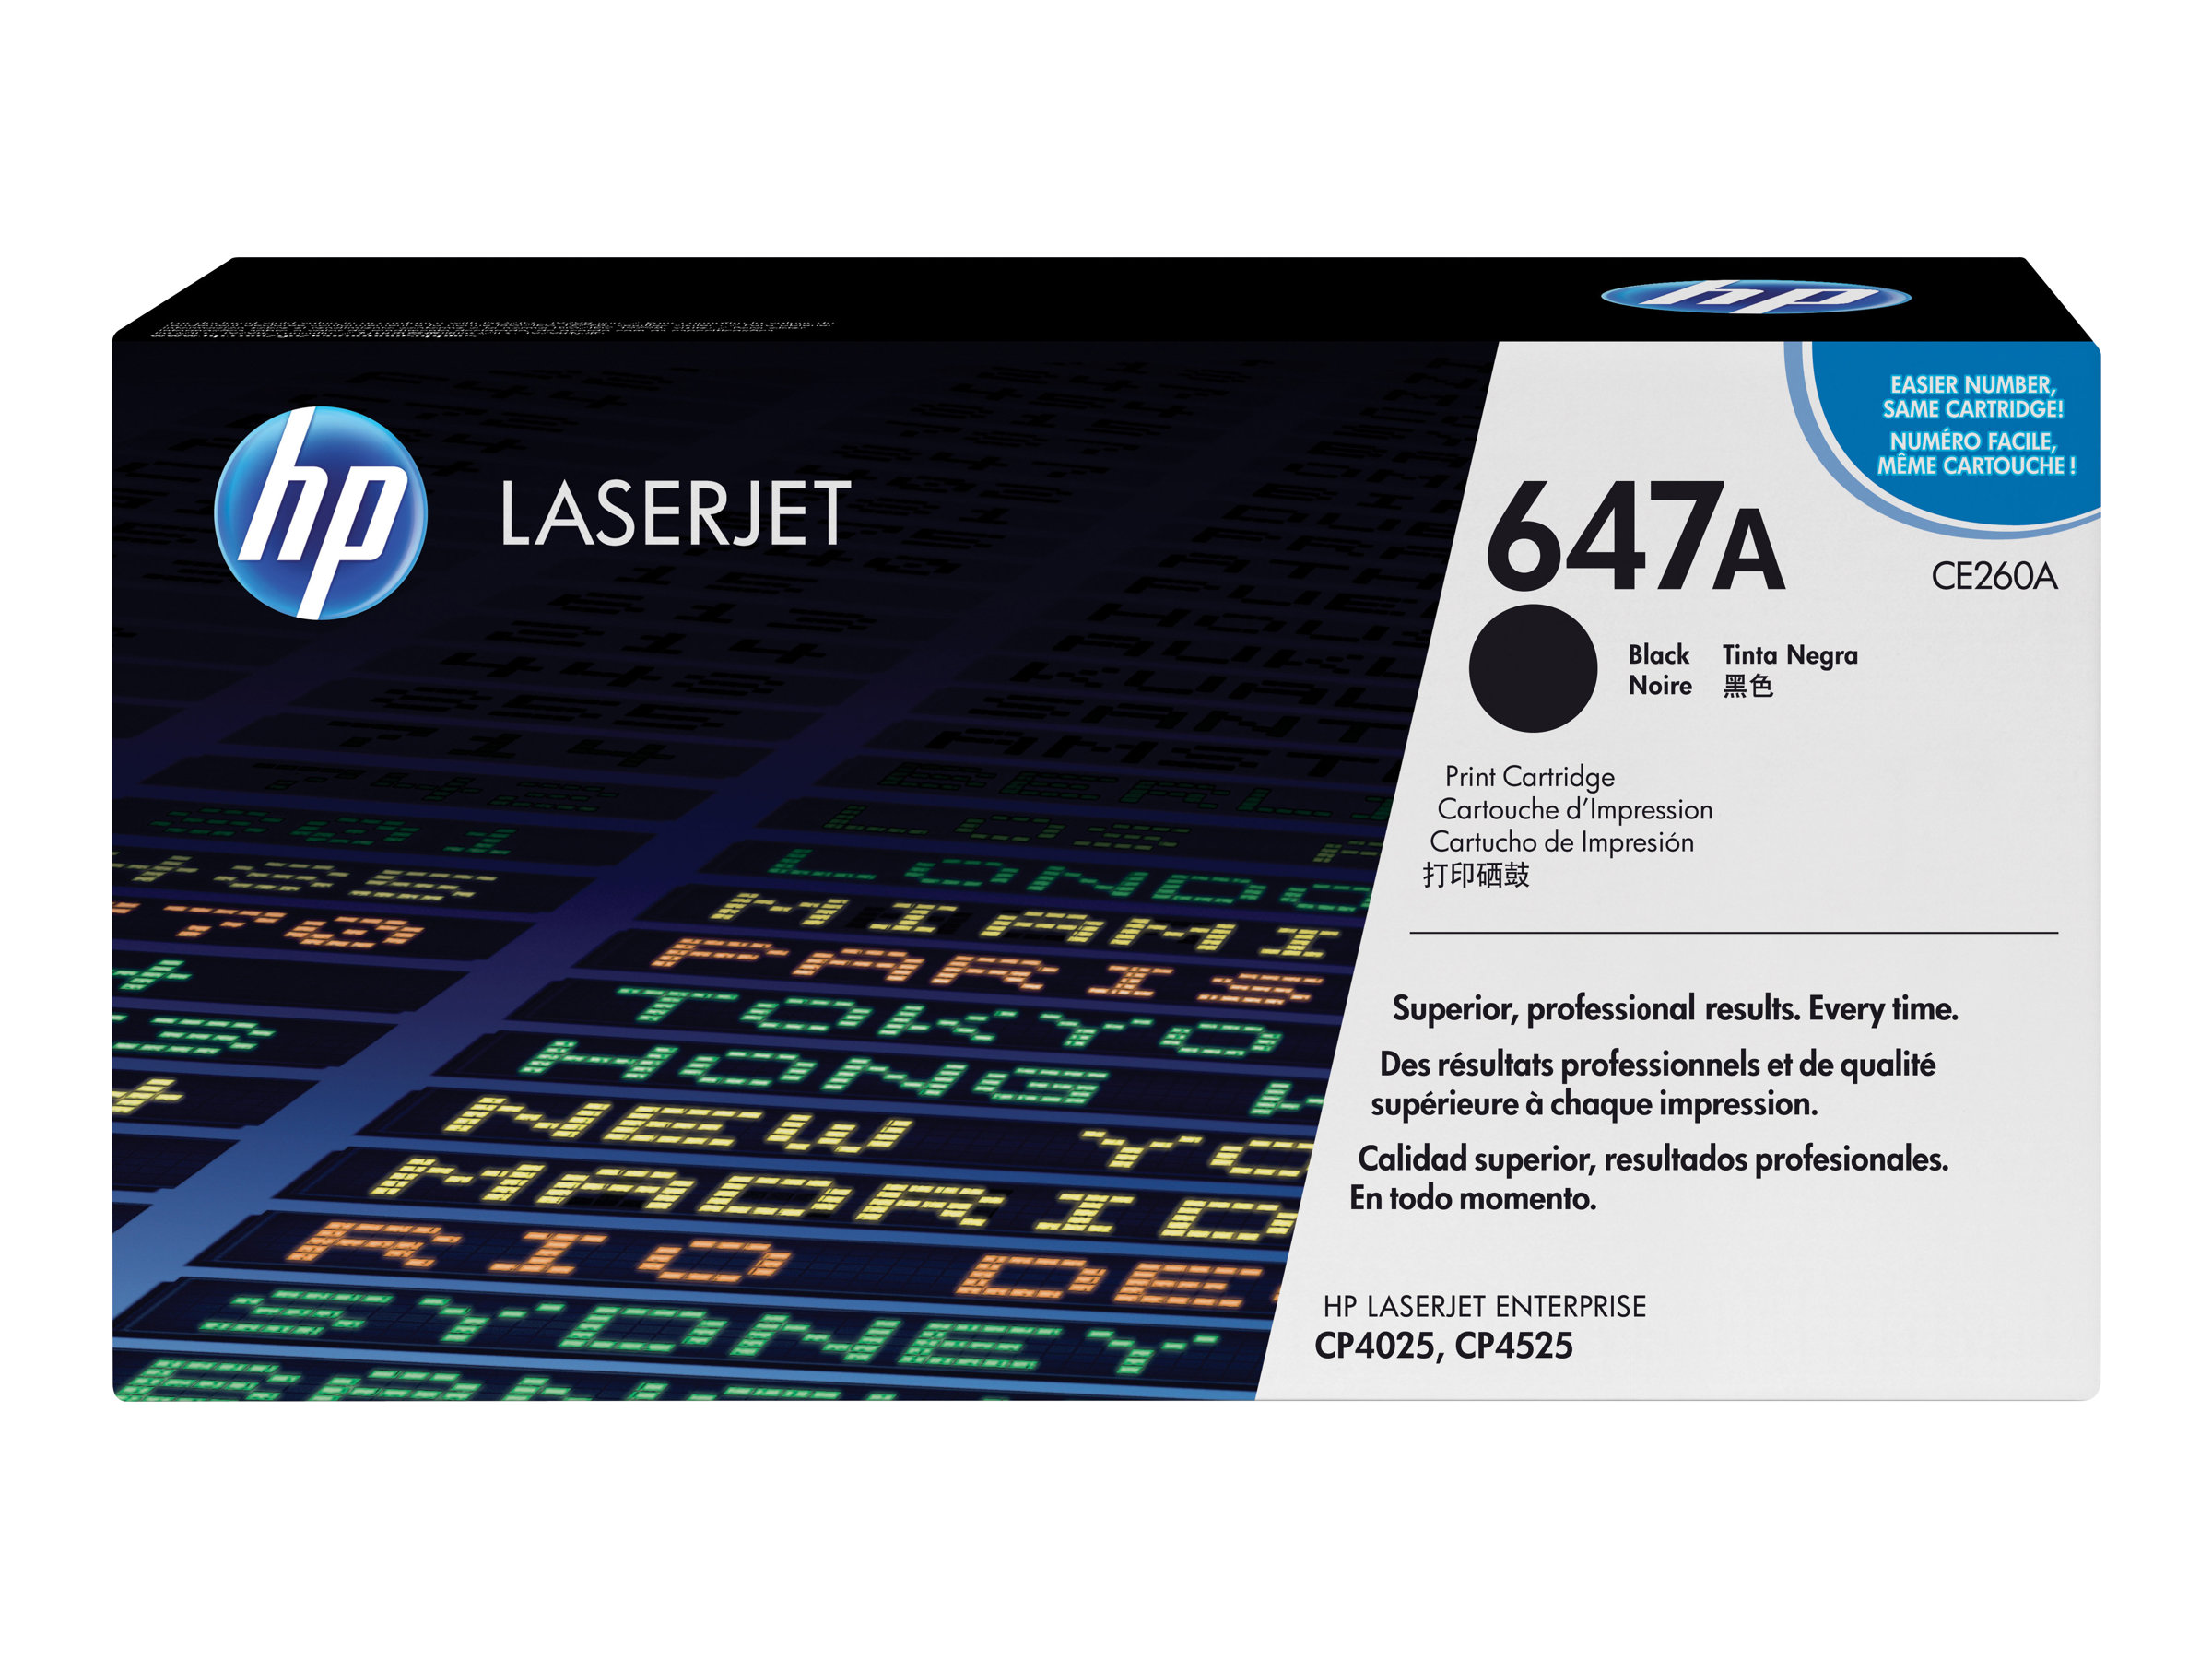 HP 647A - Schwarz - Original - LaserJet - Tonerpatrone (CE260A) - für Color LaserJet Enterprise CP4025, CP4525; LaserJet Enterpr